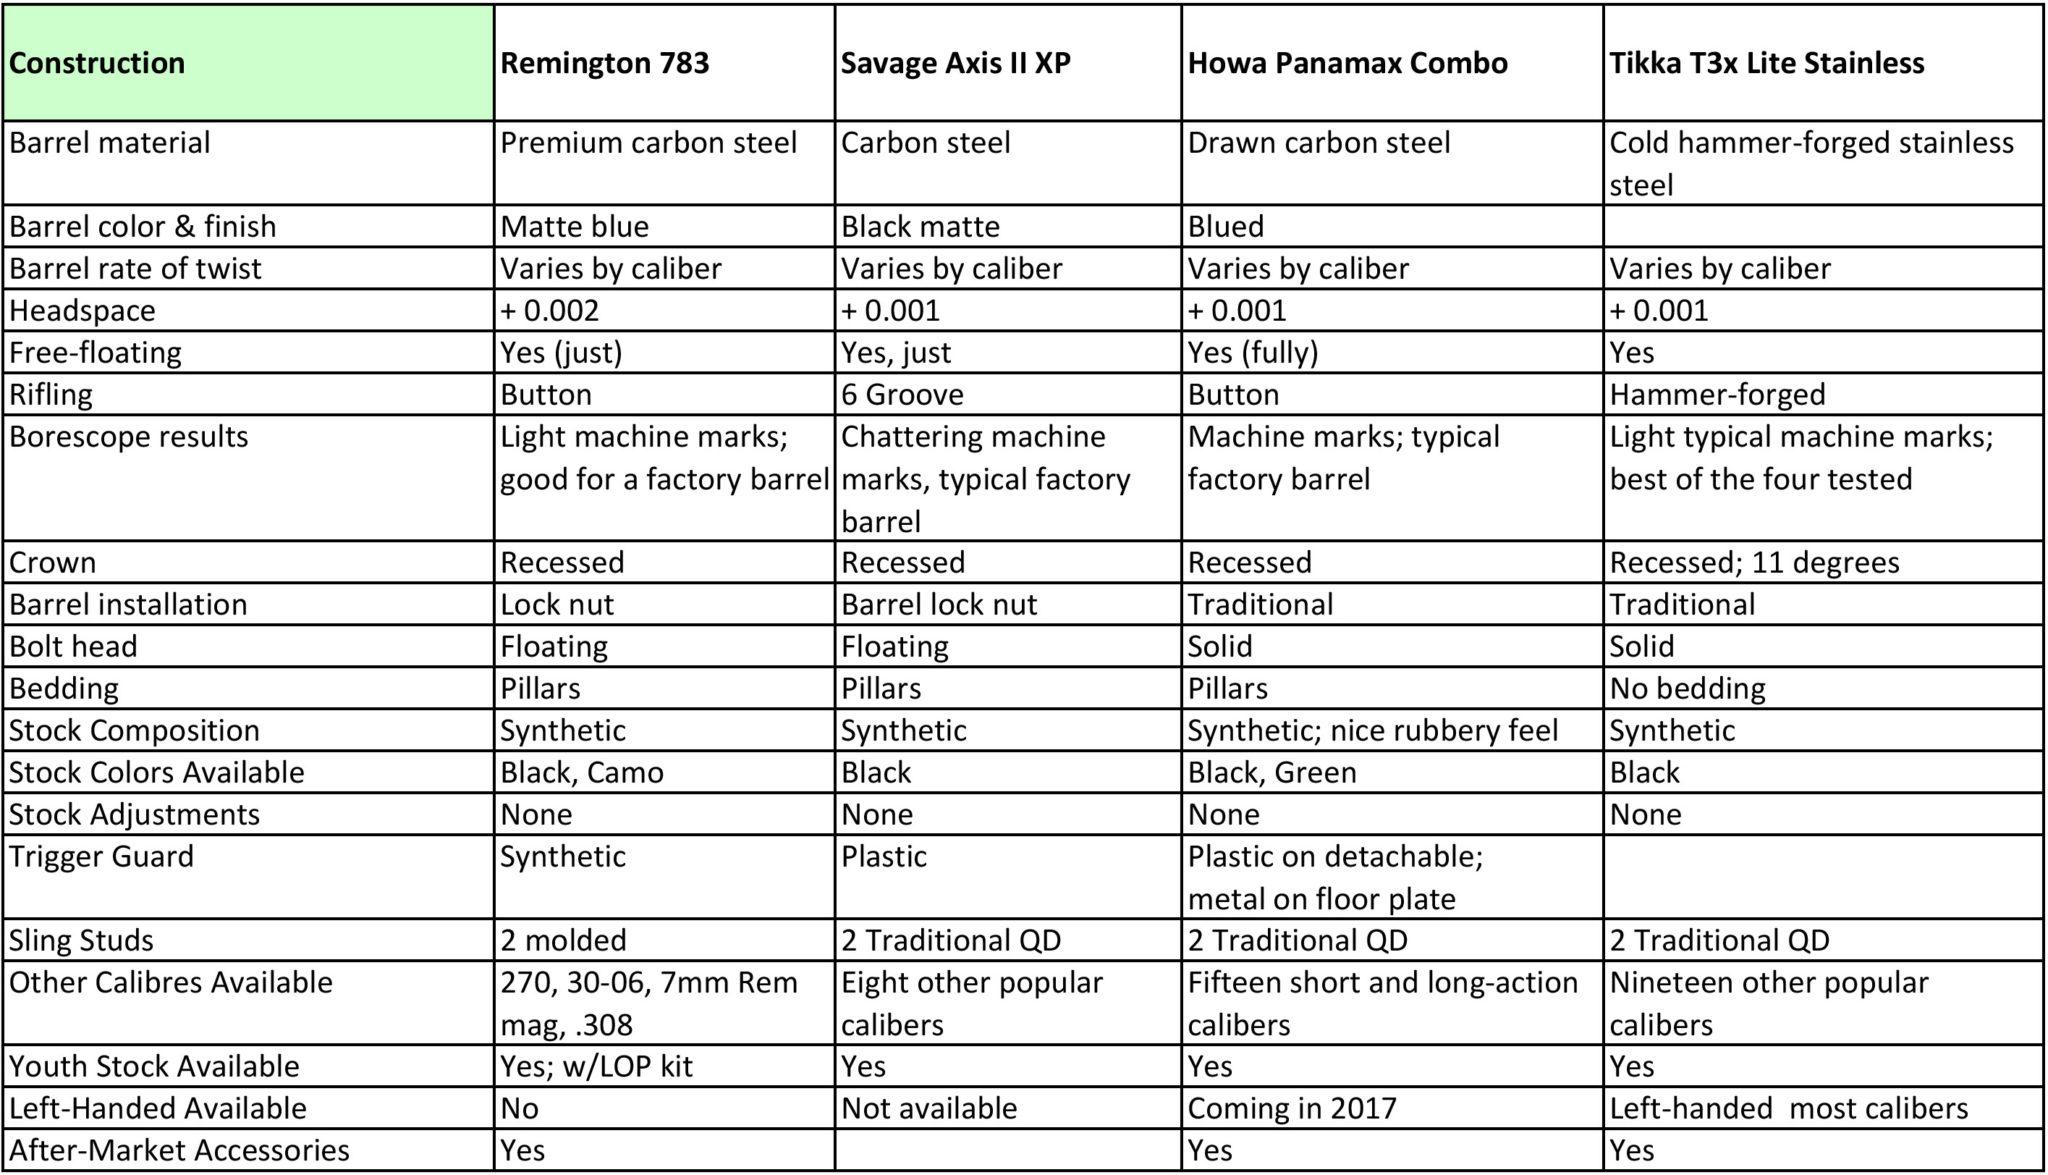 Hunting rifle comparison